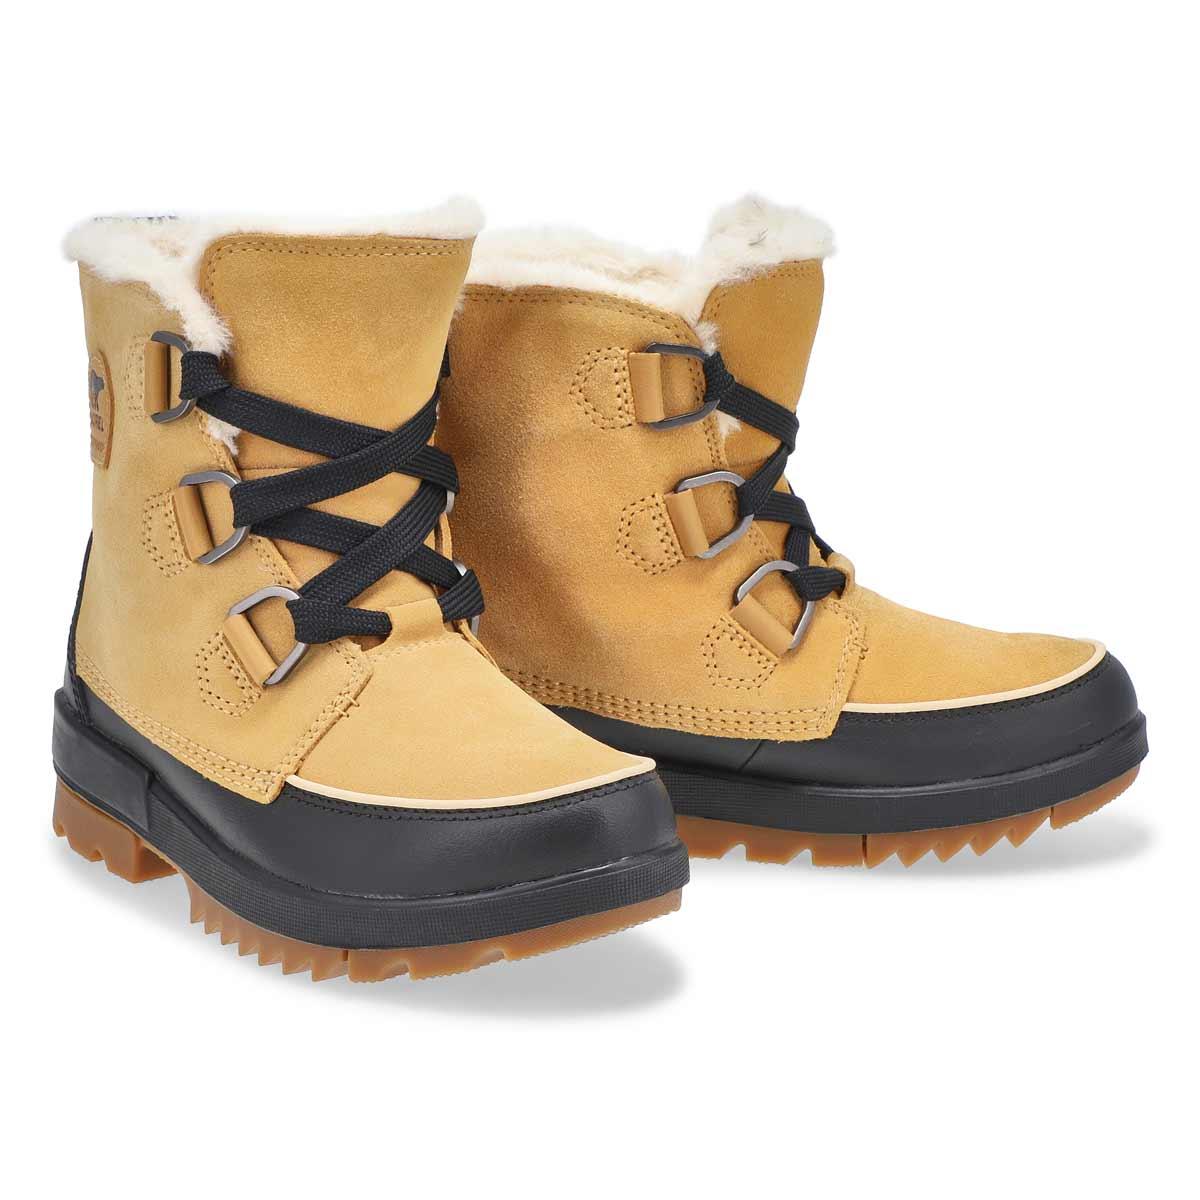 Women's Tivoli IV Waterproof Boot - Curry/Black